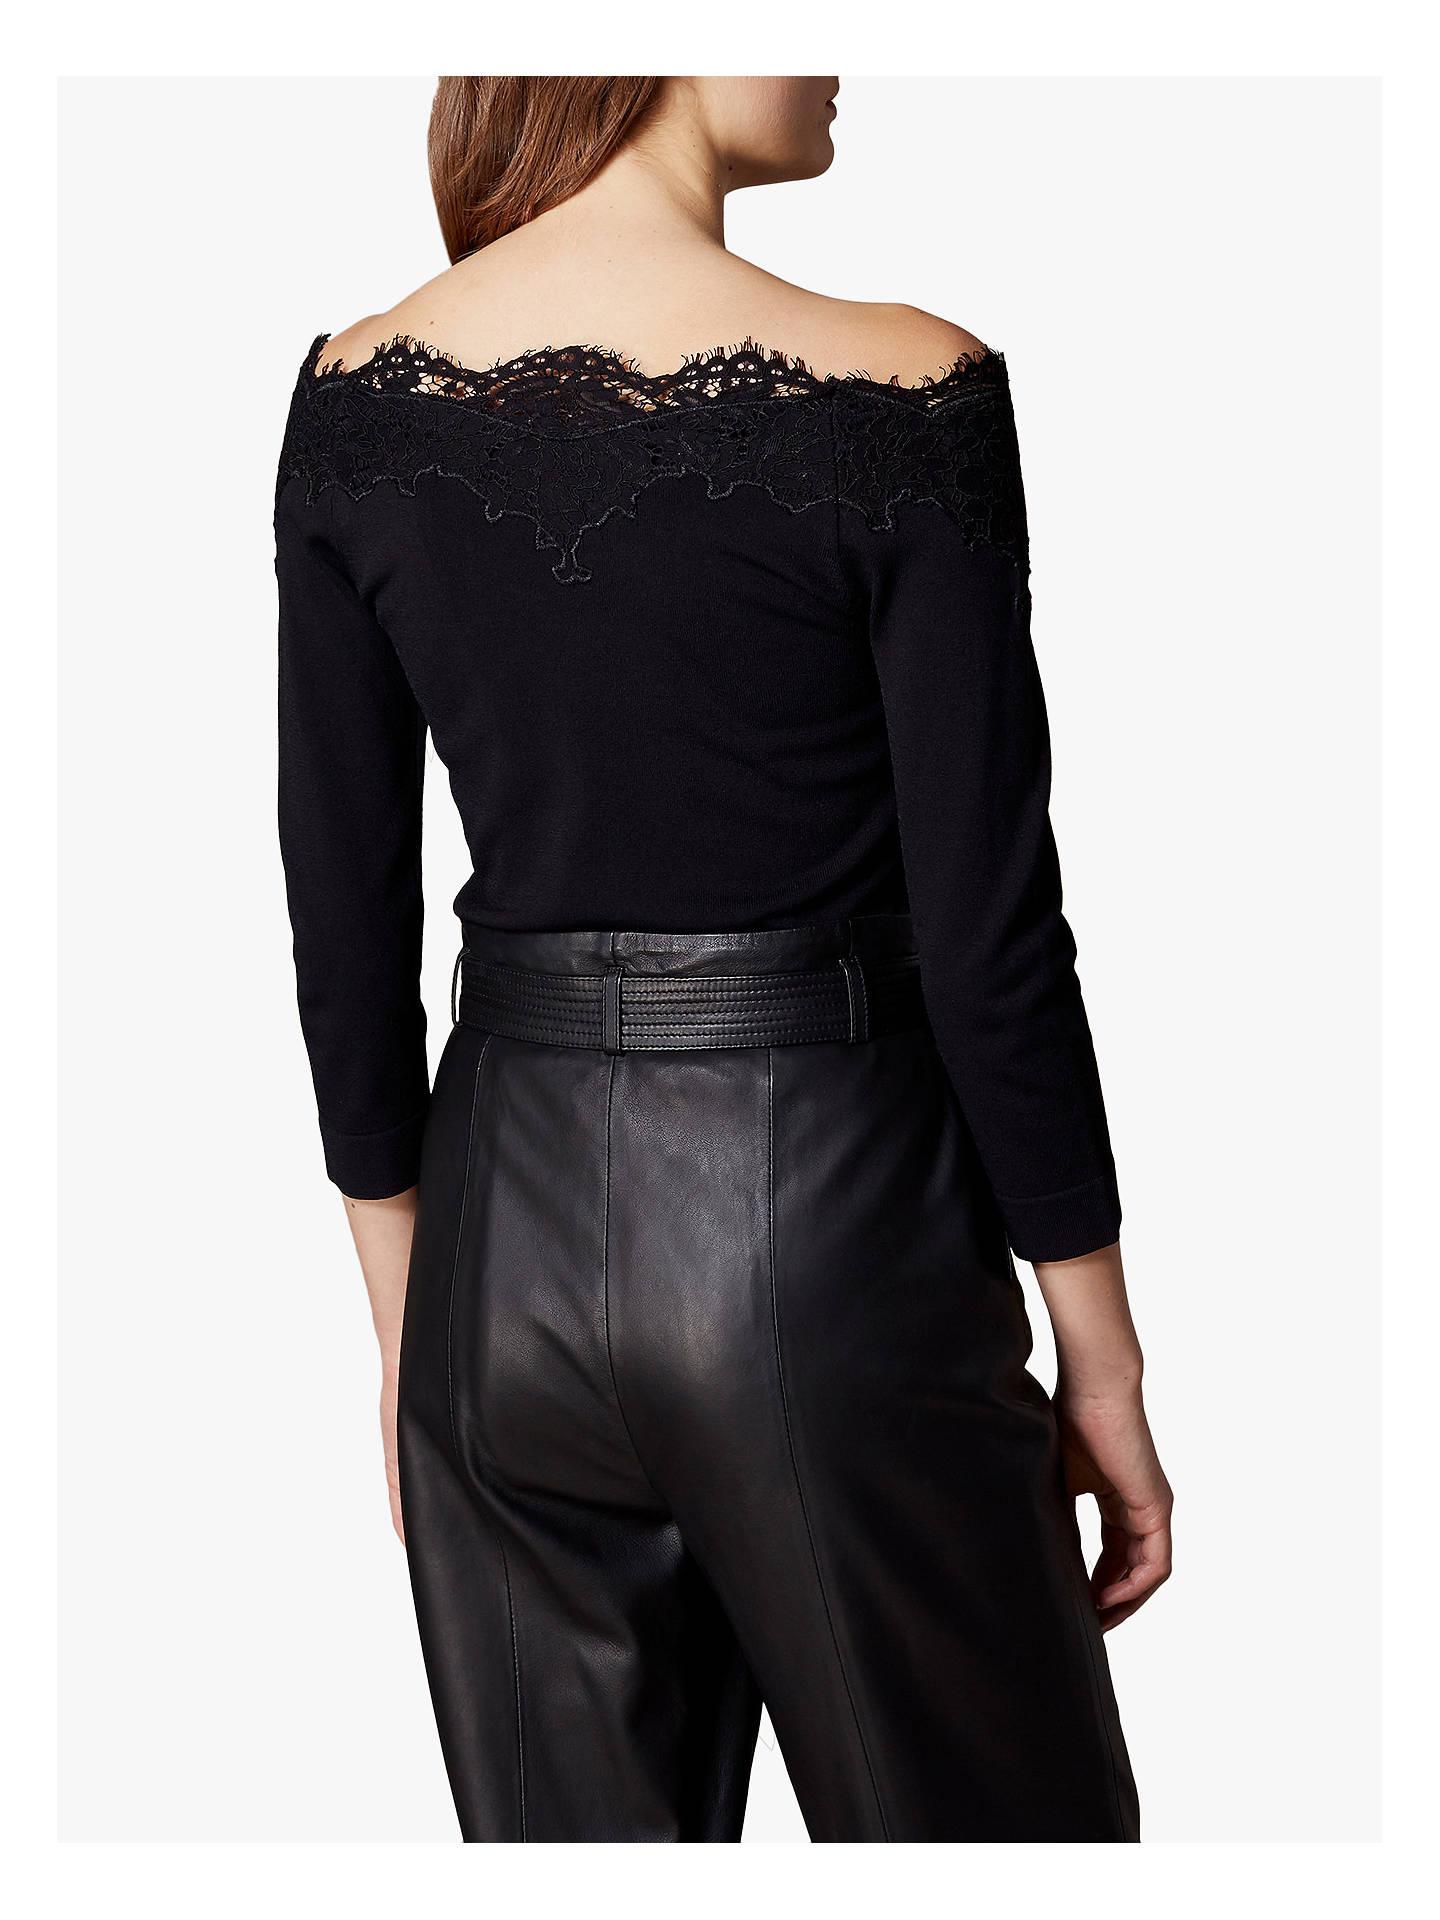 dd7cb8b9fb8ce ... Buy Karen Millen Lace Bardot Top